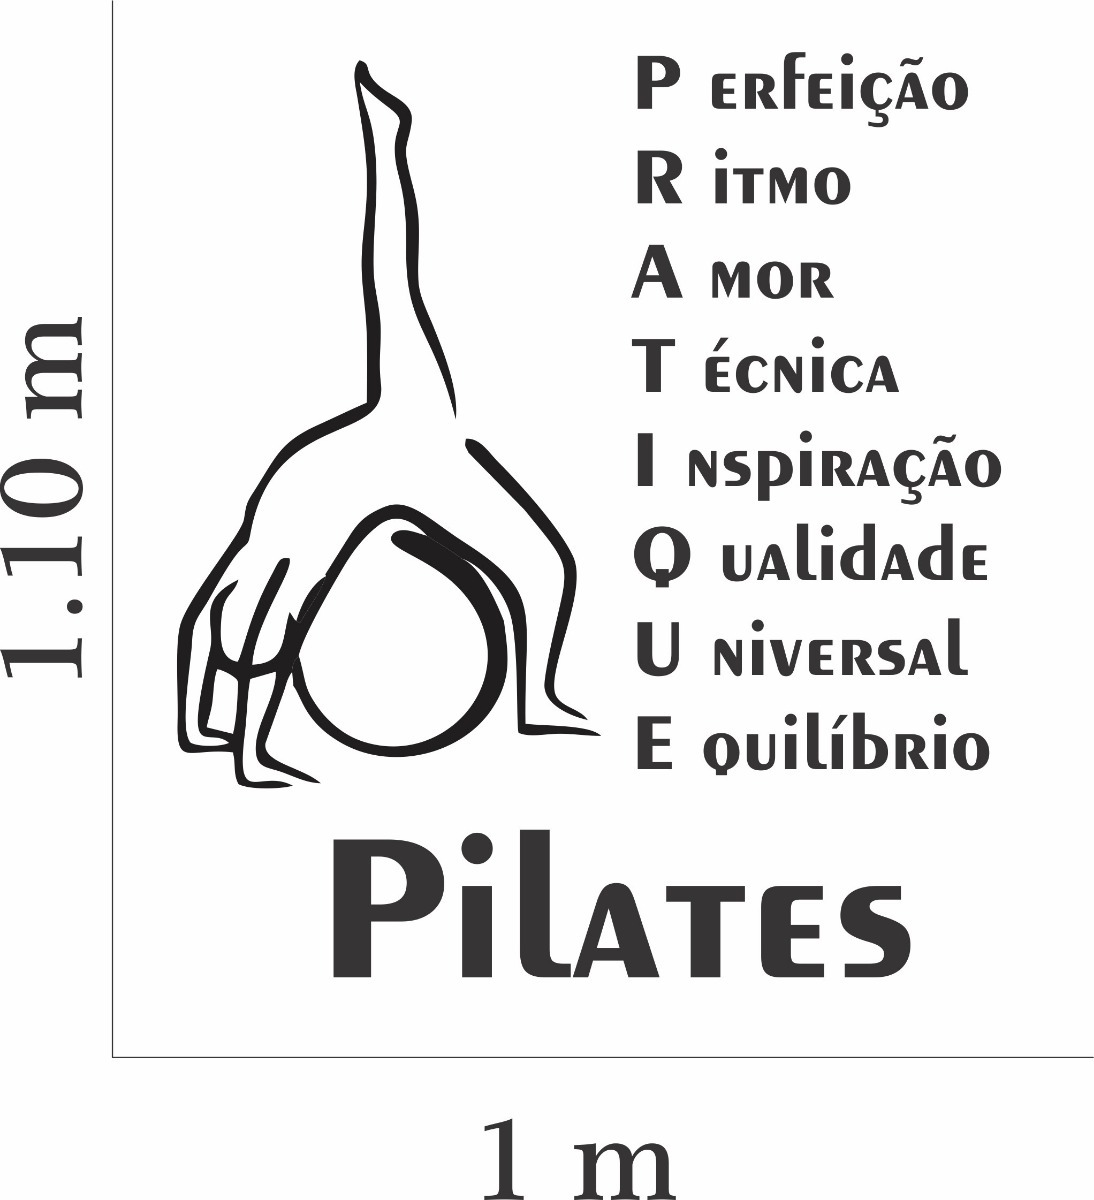 Adesivo Parede Academia Estúdio Pilates Frase Pratique